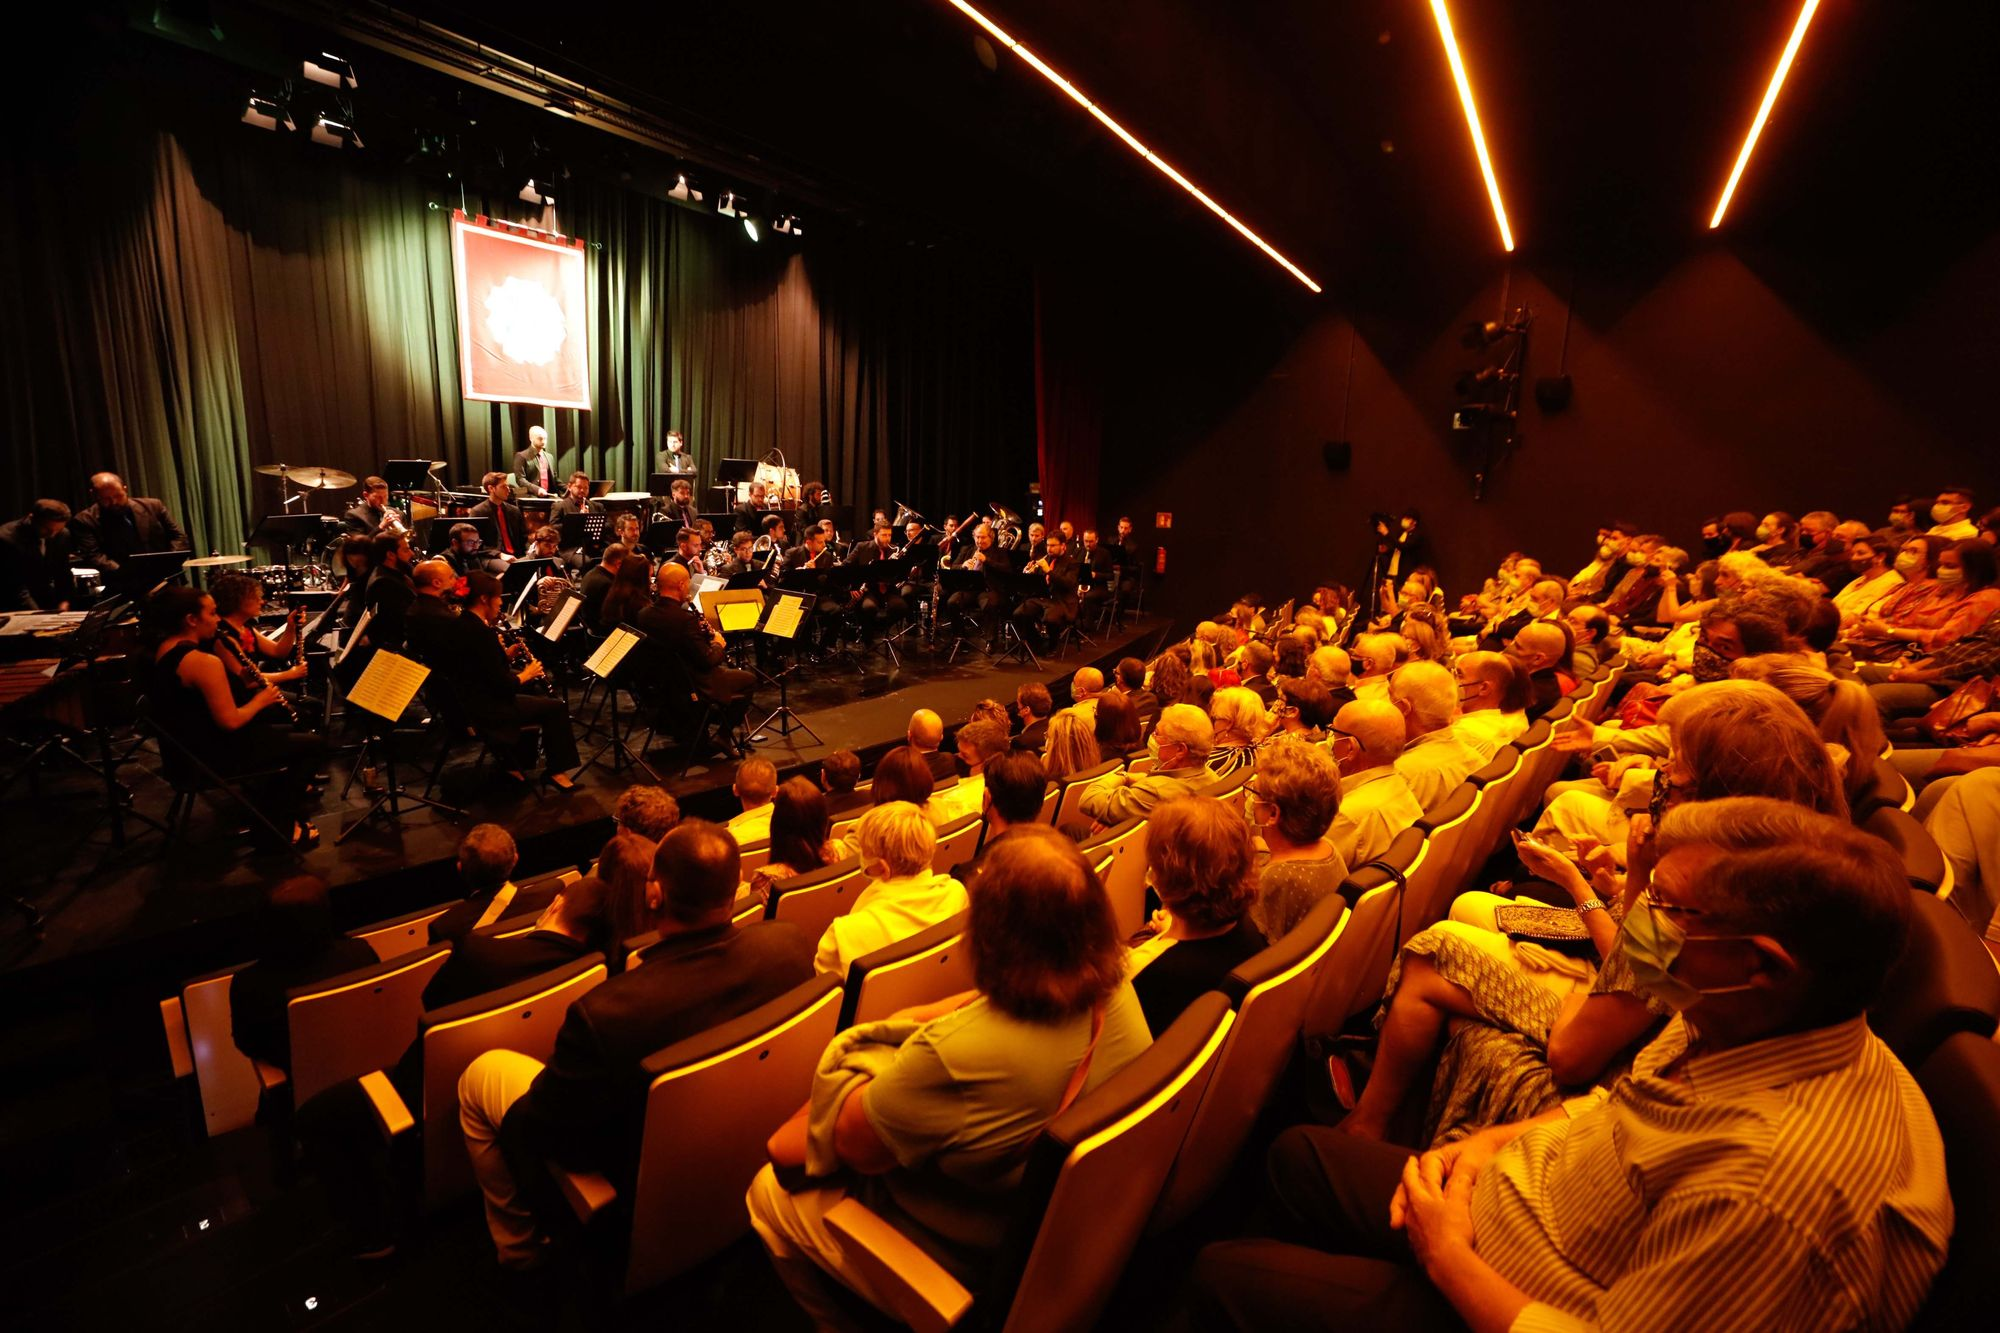 Inauguración Auditorio Caló de s'Oli